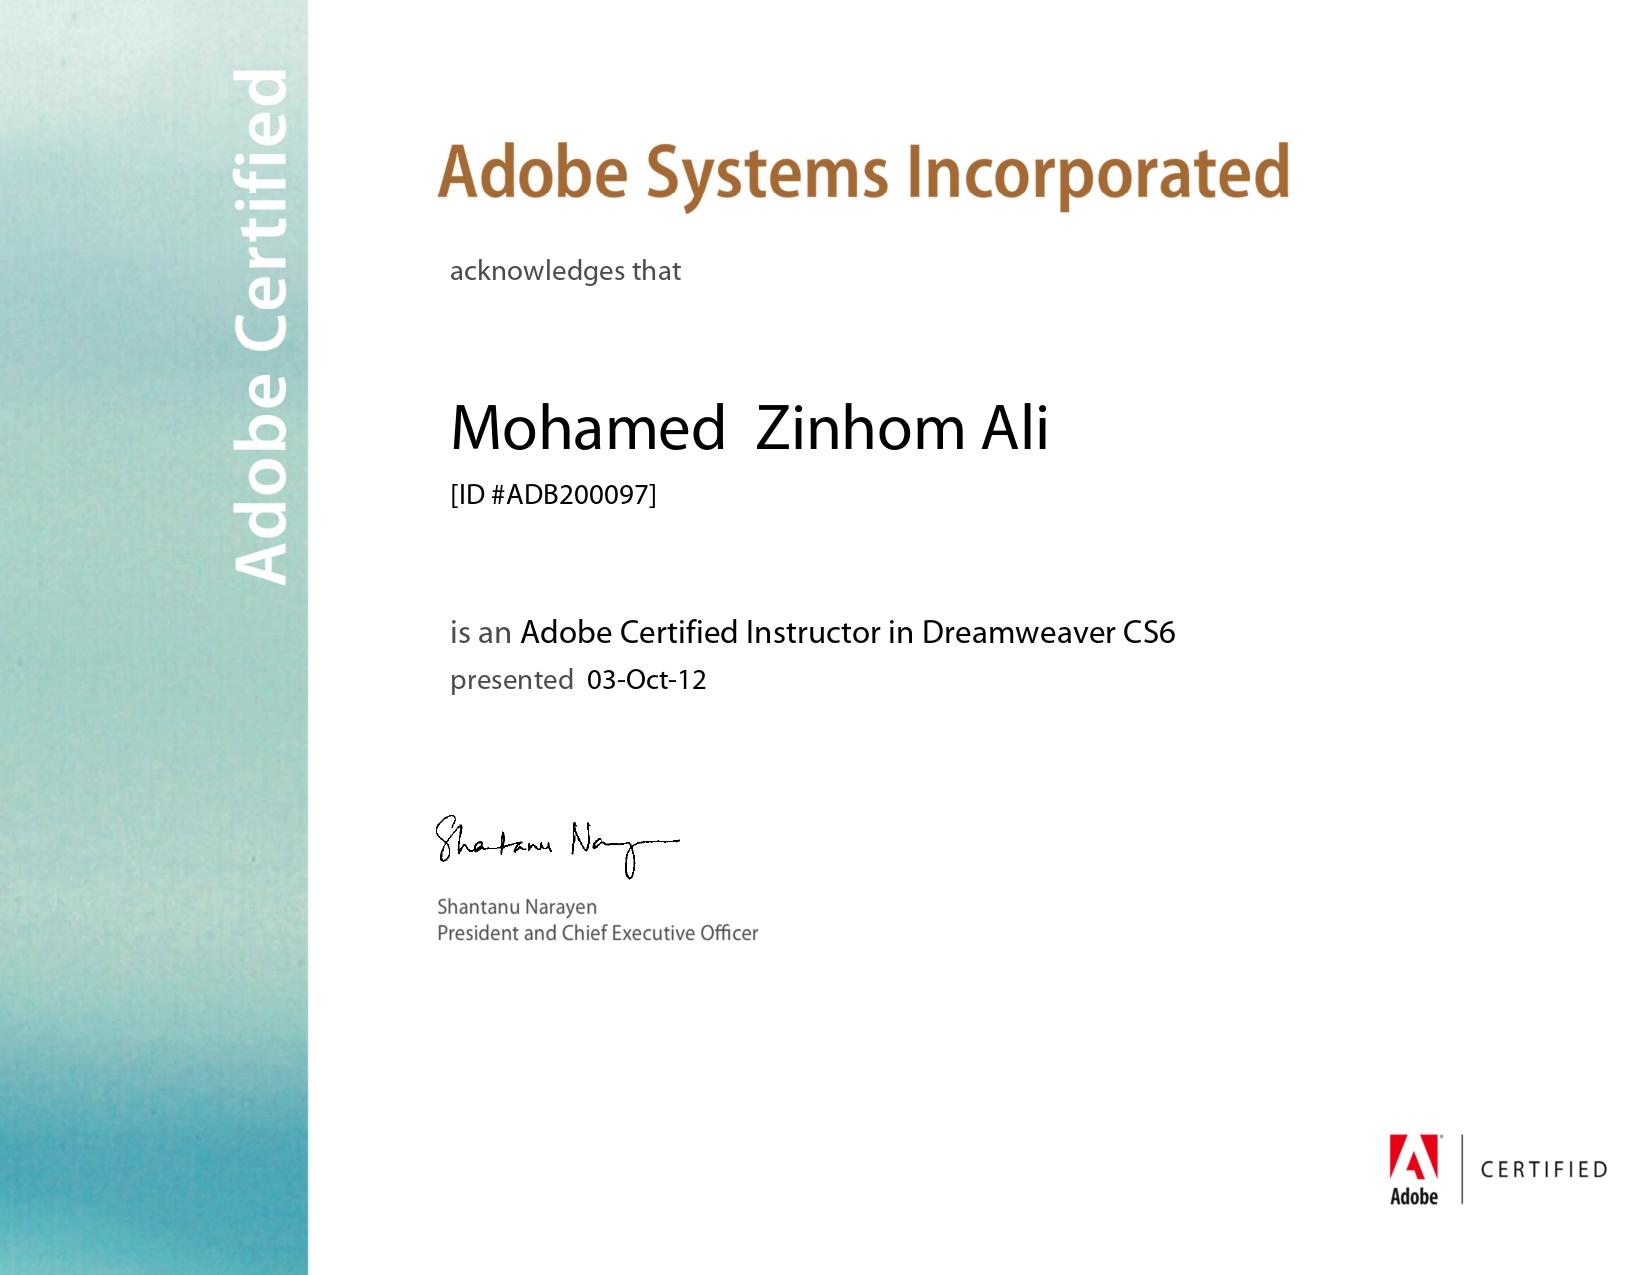 Adobe Certified Instructor Dreamweaver CS6